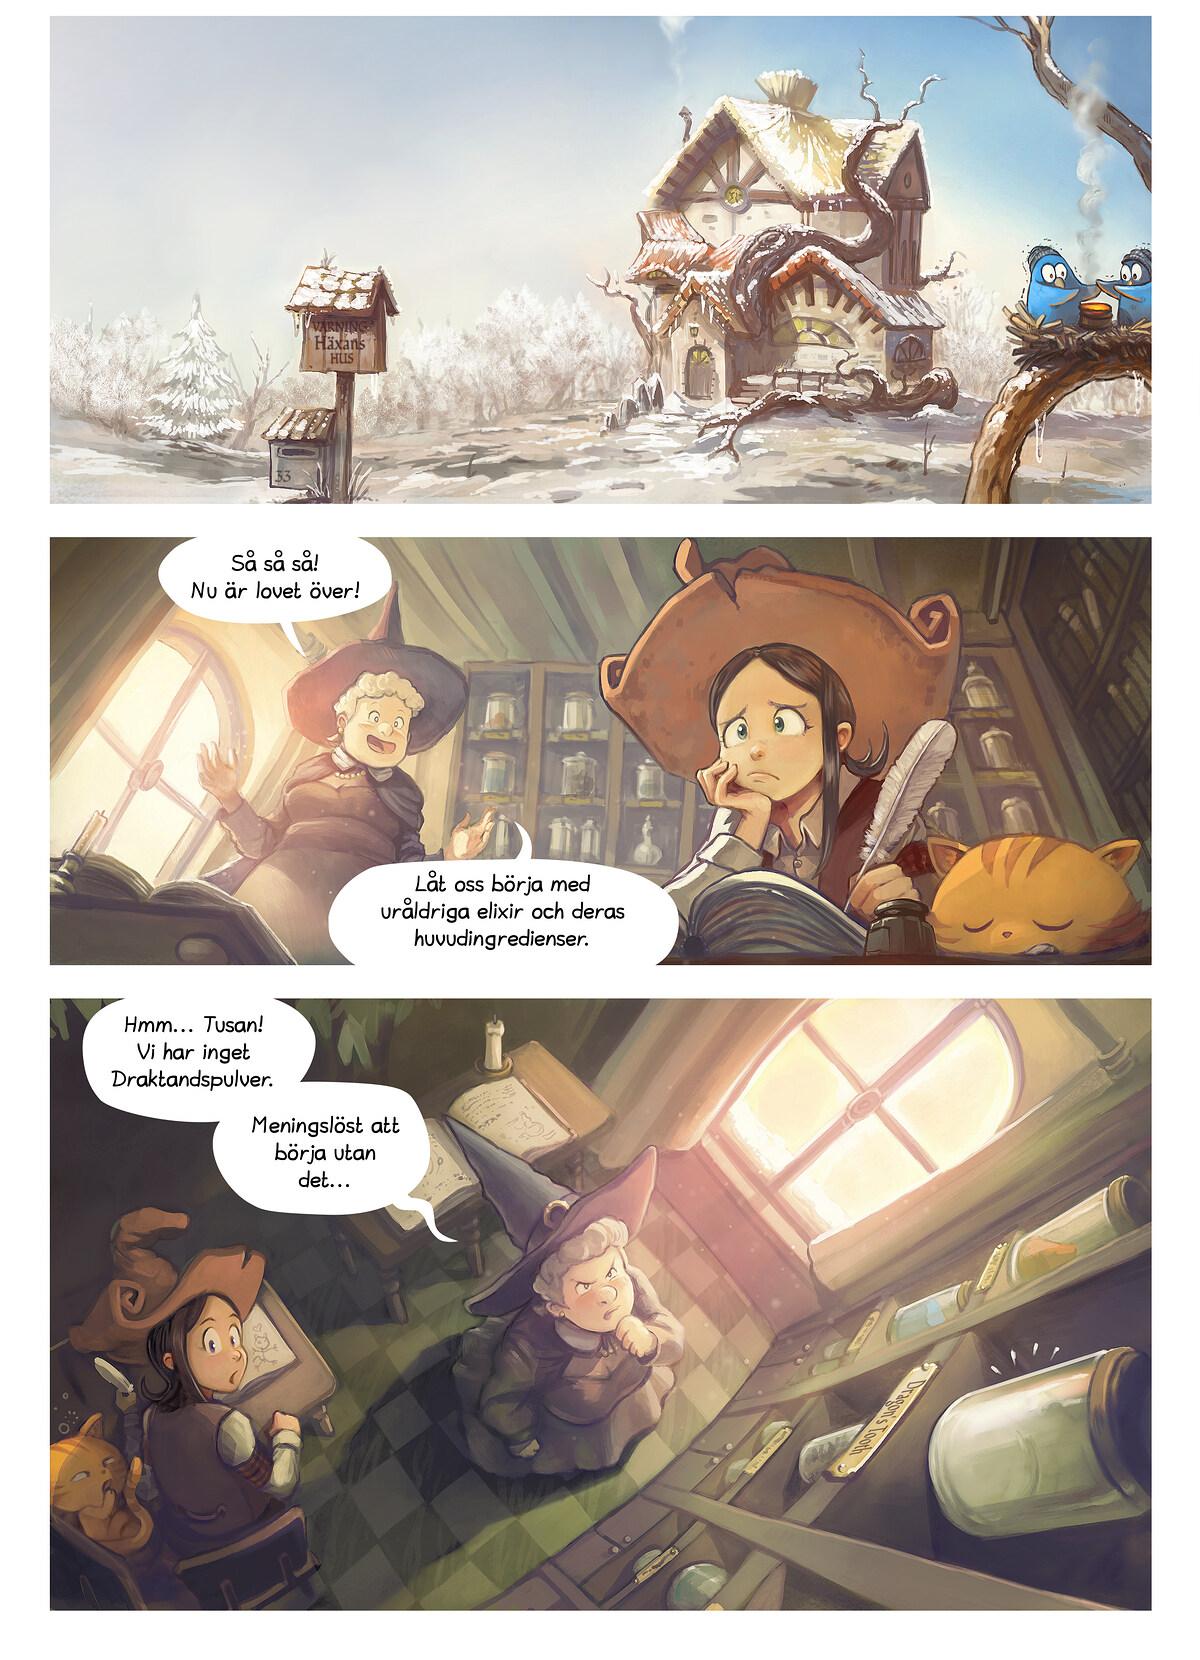 Episode 14: Draktanden, Page 1